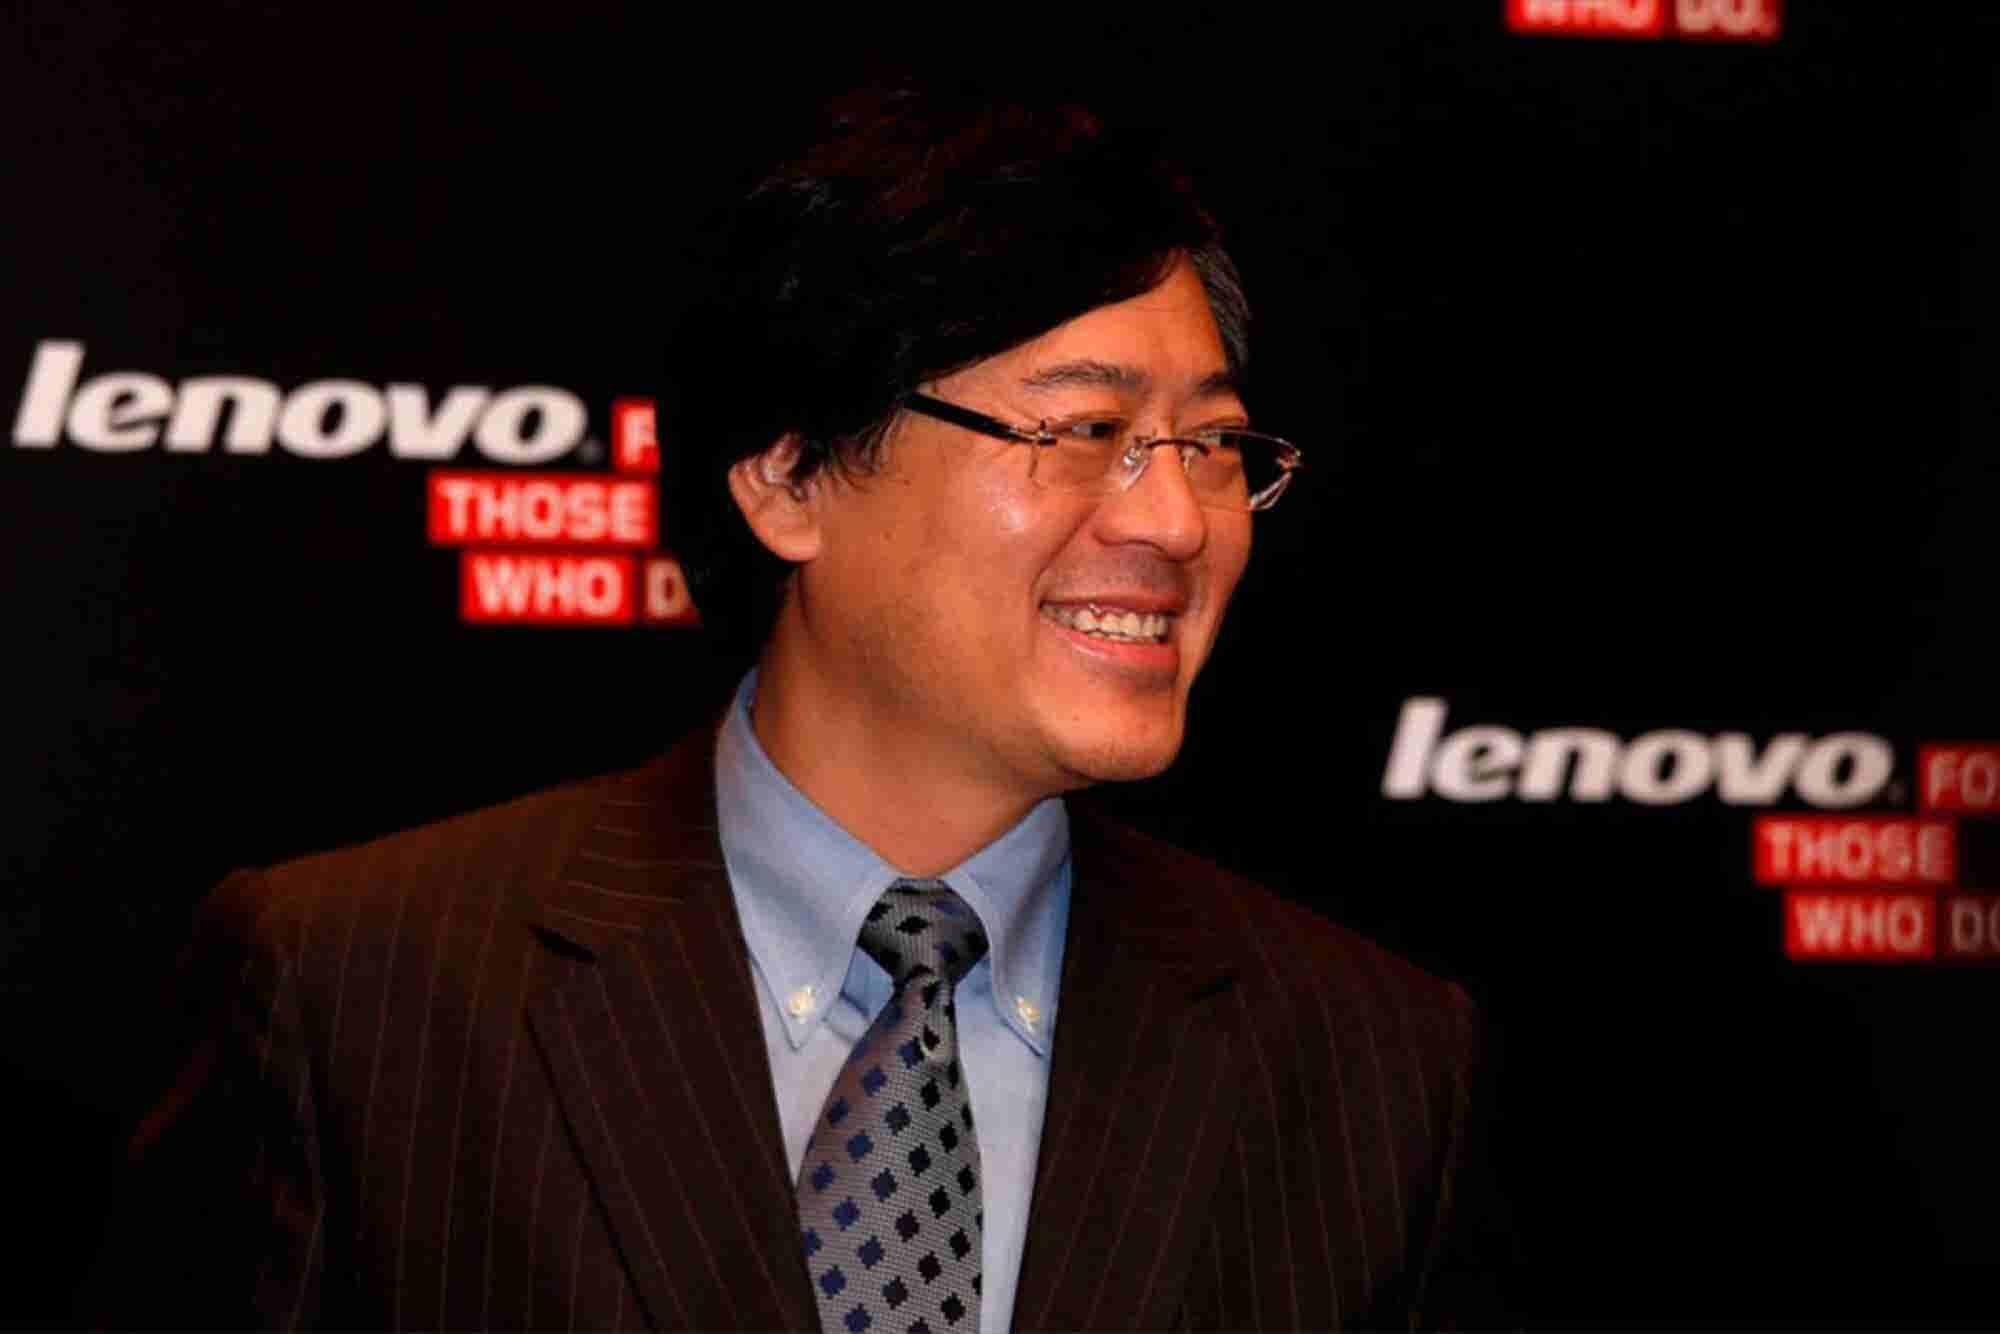 Lenovo Officially Closes $2.91 Billion Acquisition of Motorola Unit Fr...